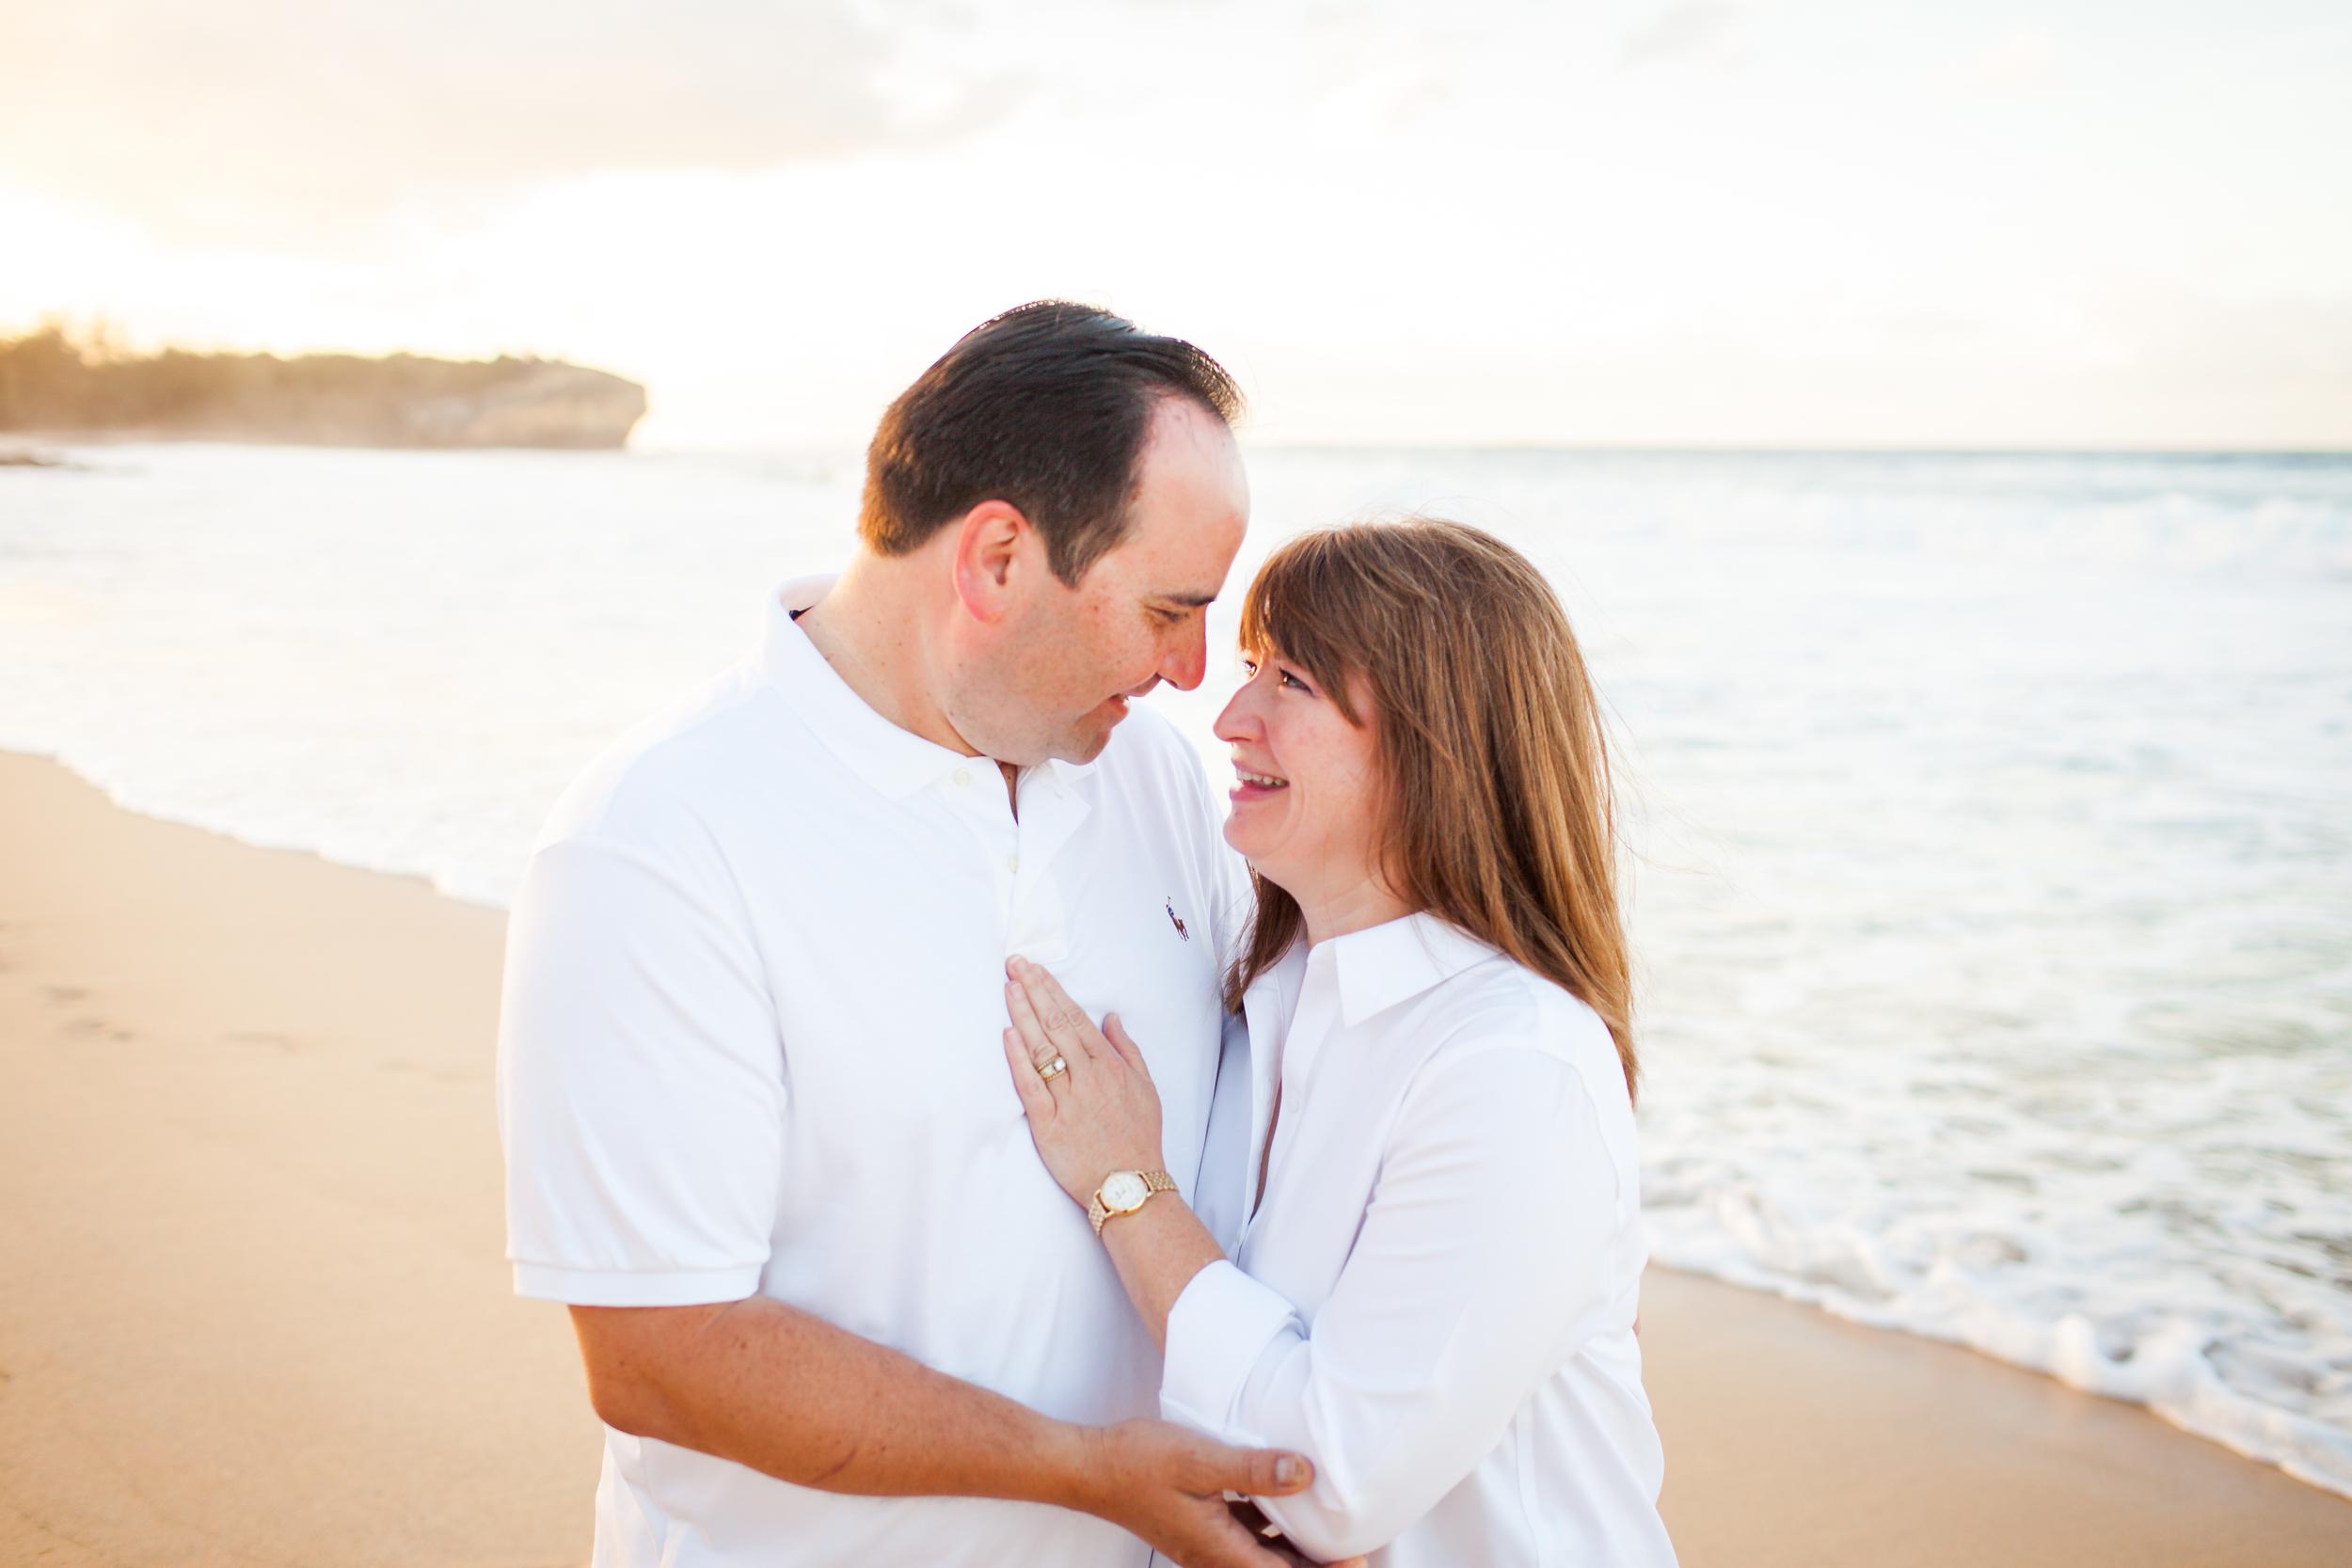 Pacific Dream Photography - Hawaii Photographer - Portrait Photographer - Family Photographer-2